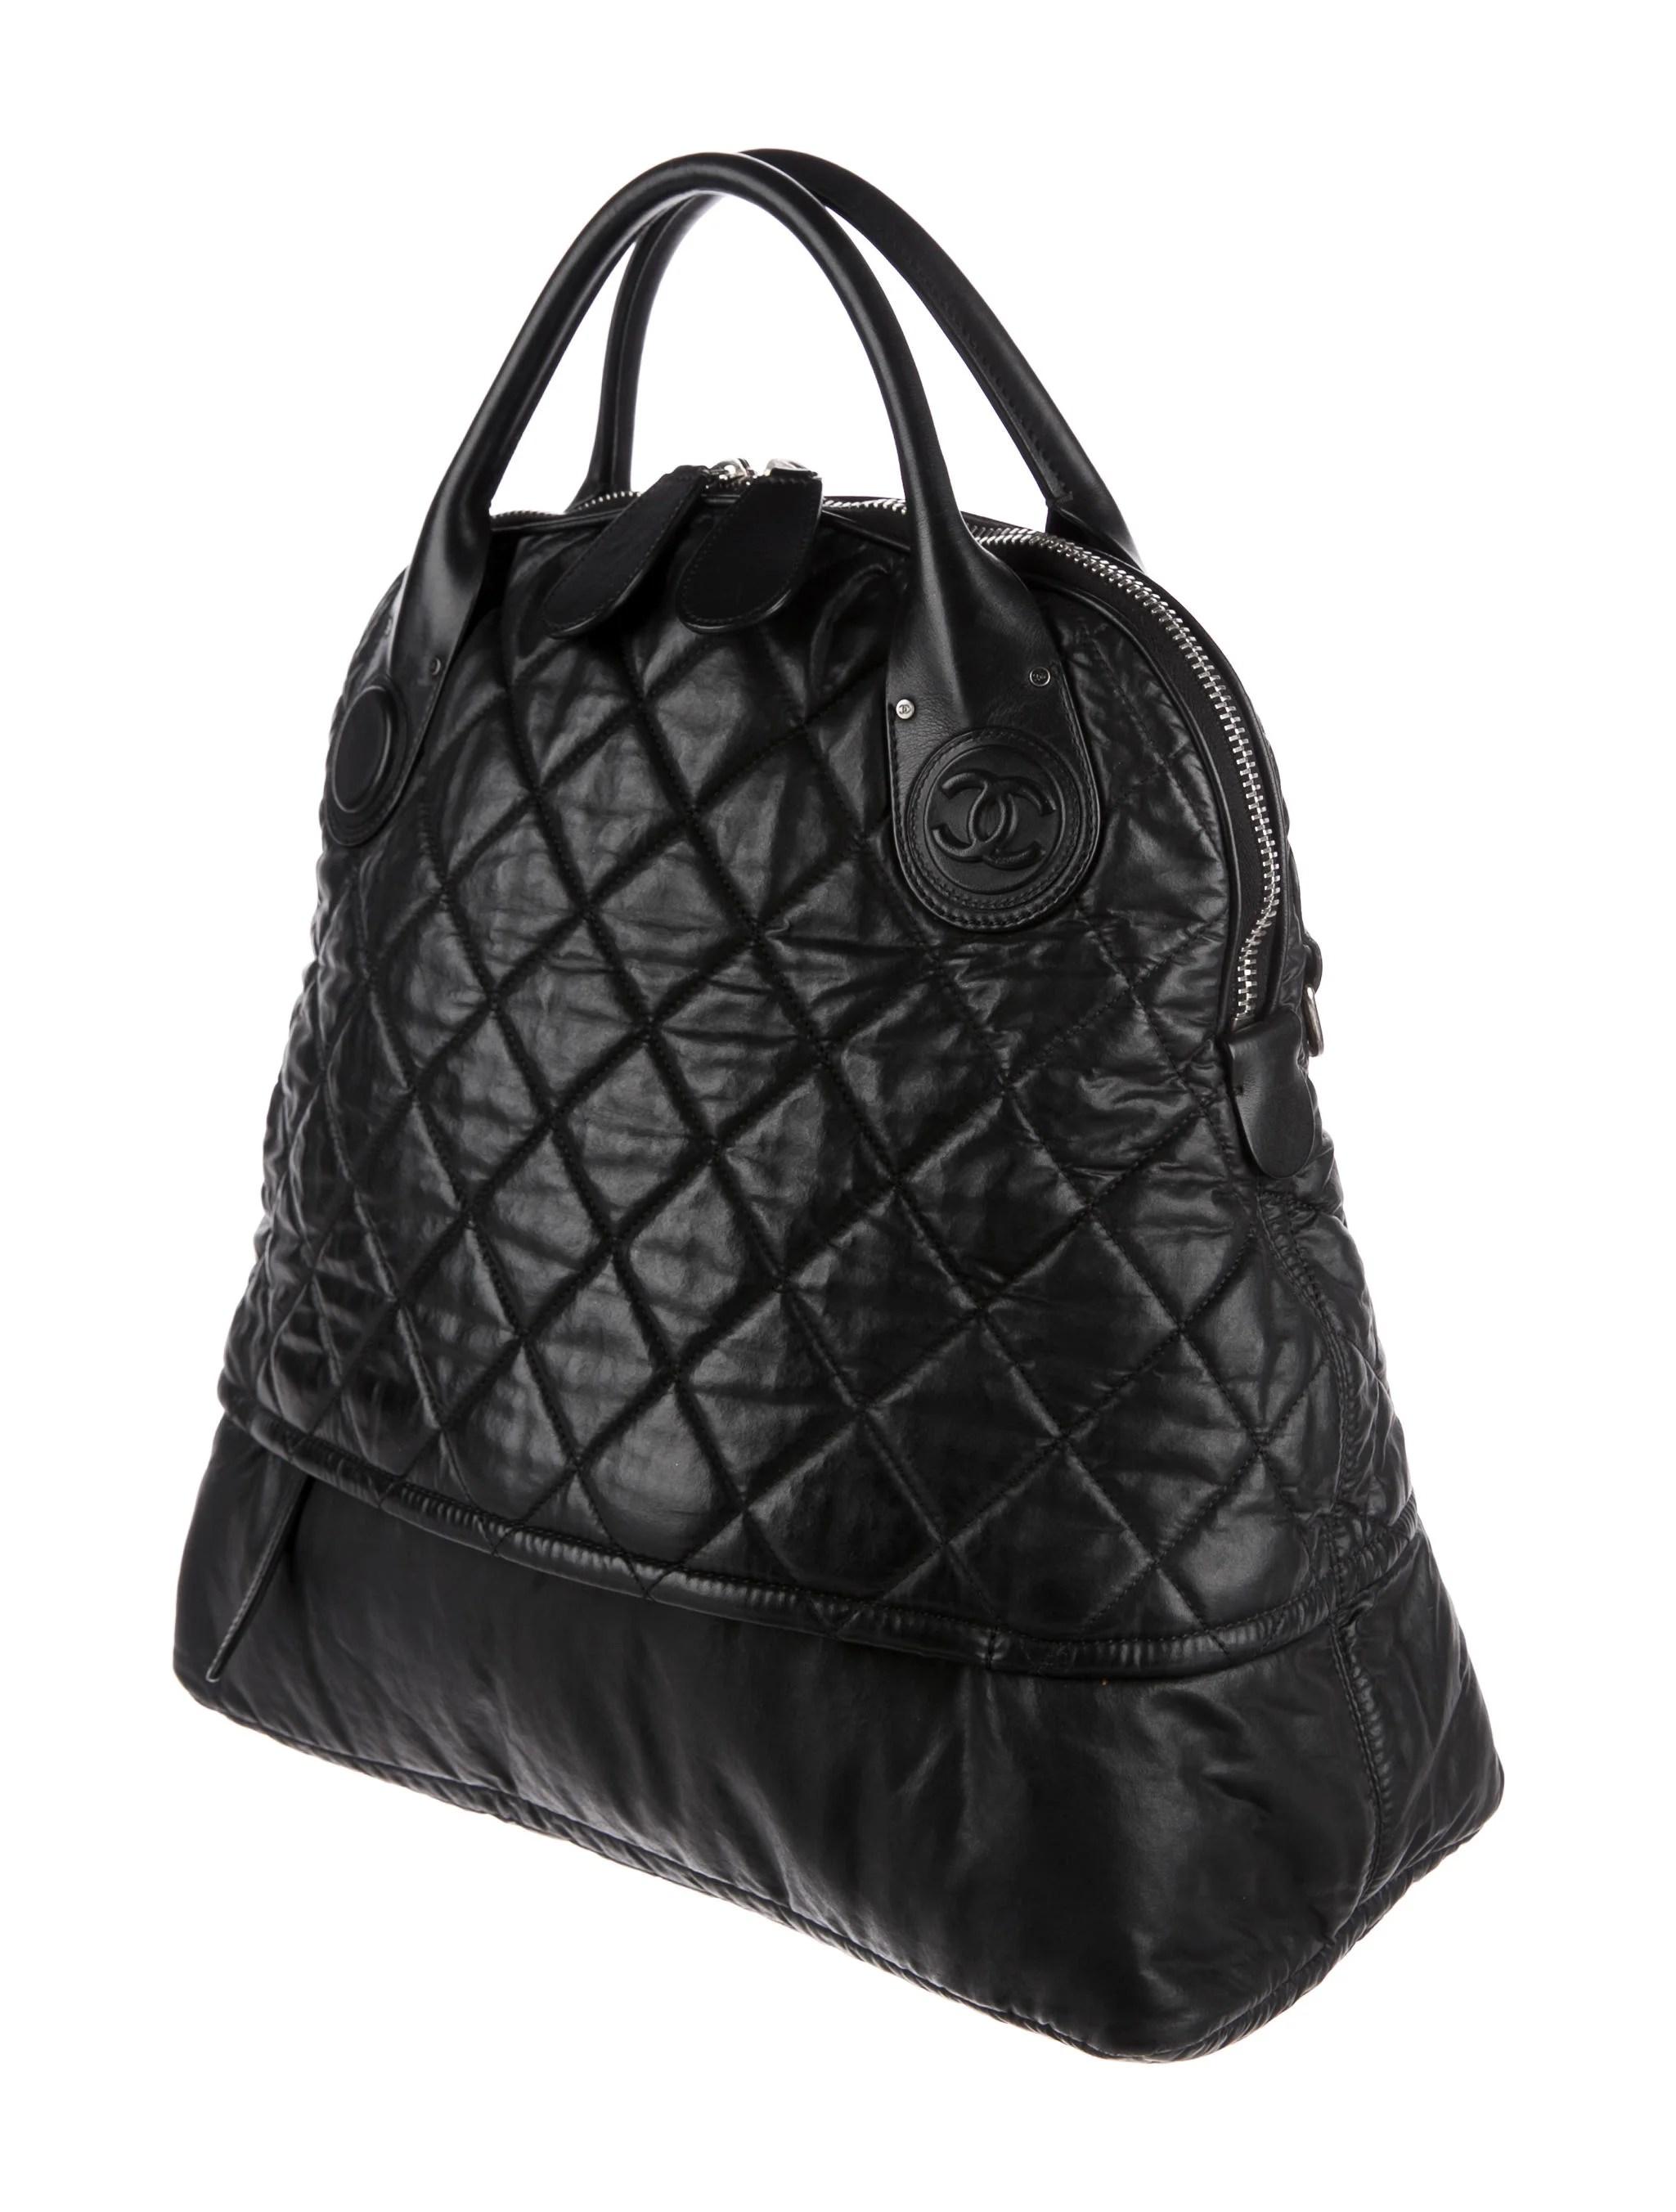 Chanel Coco Cocoon Satchel - Handbags - CHA202402   The ...